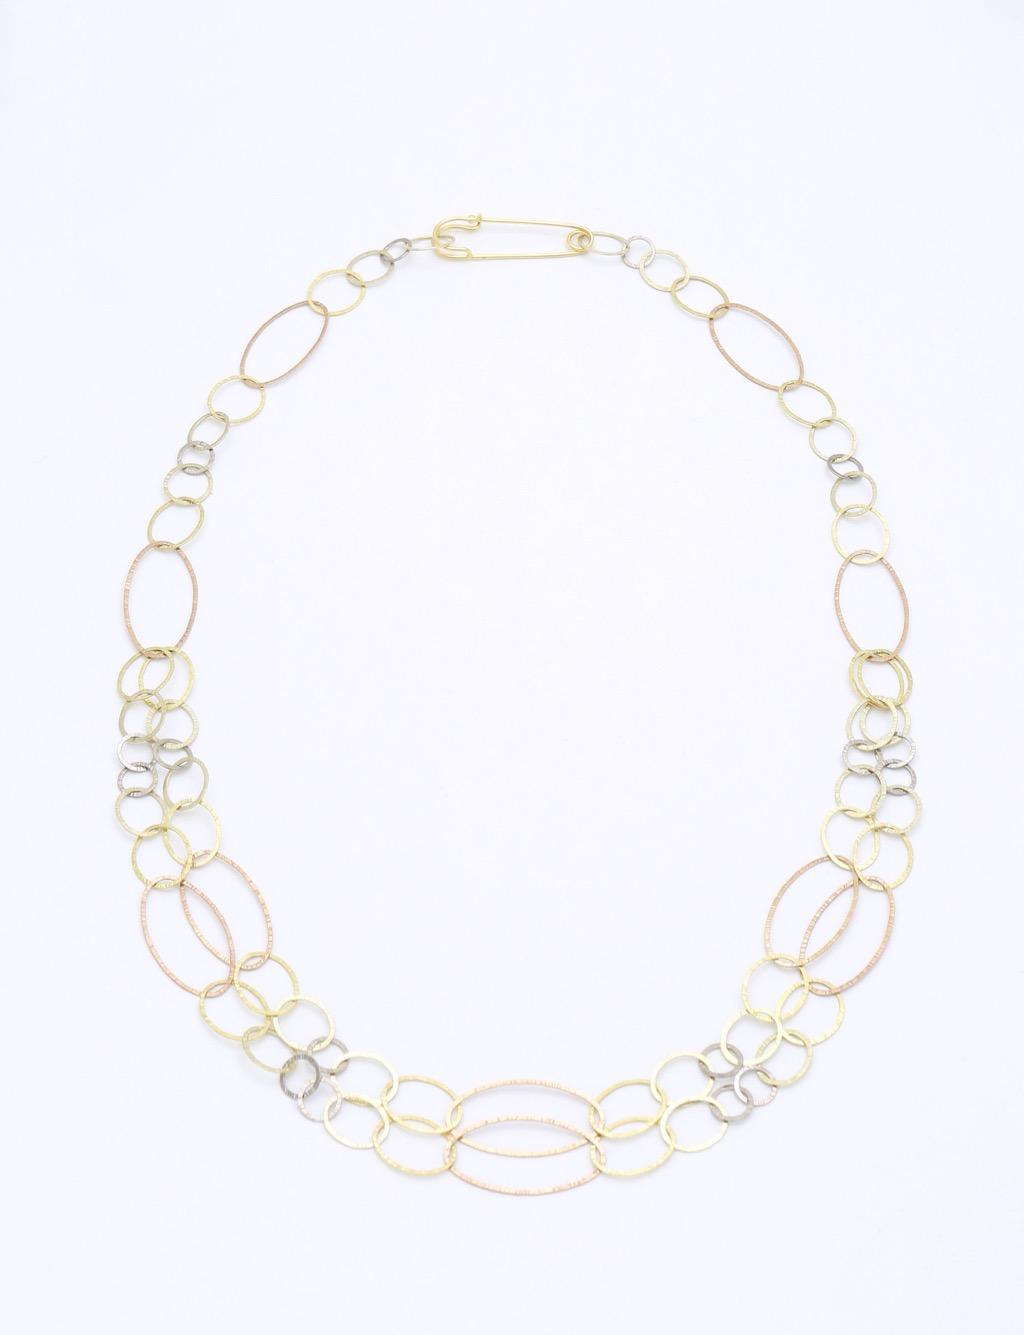 image6_MK59_necklace(long) (1).jpg